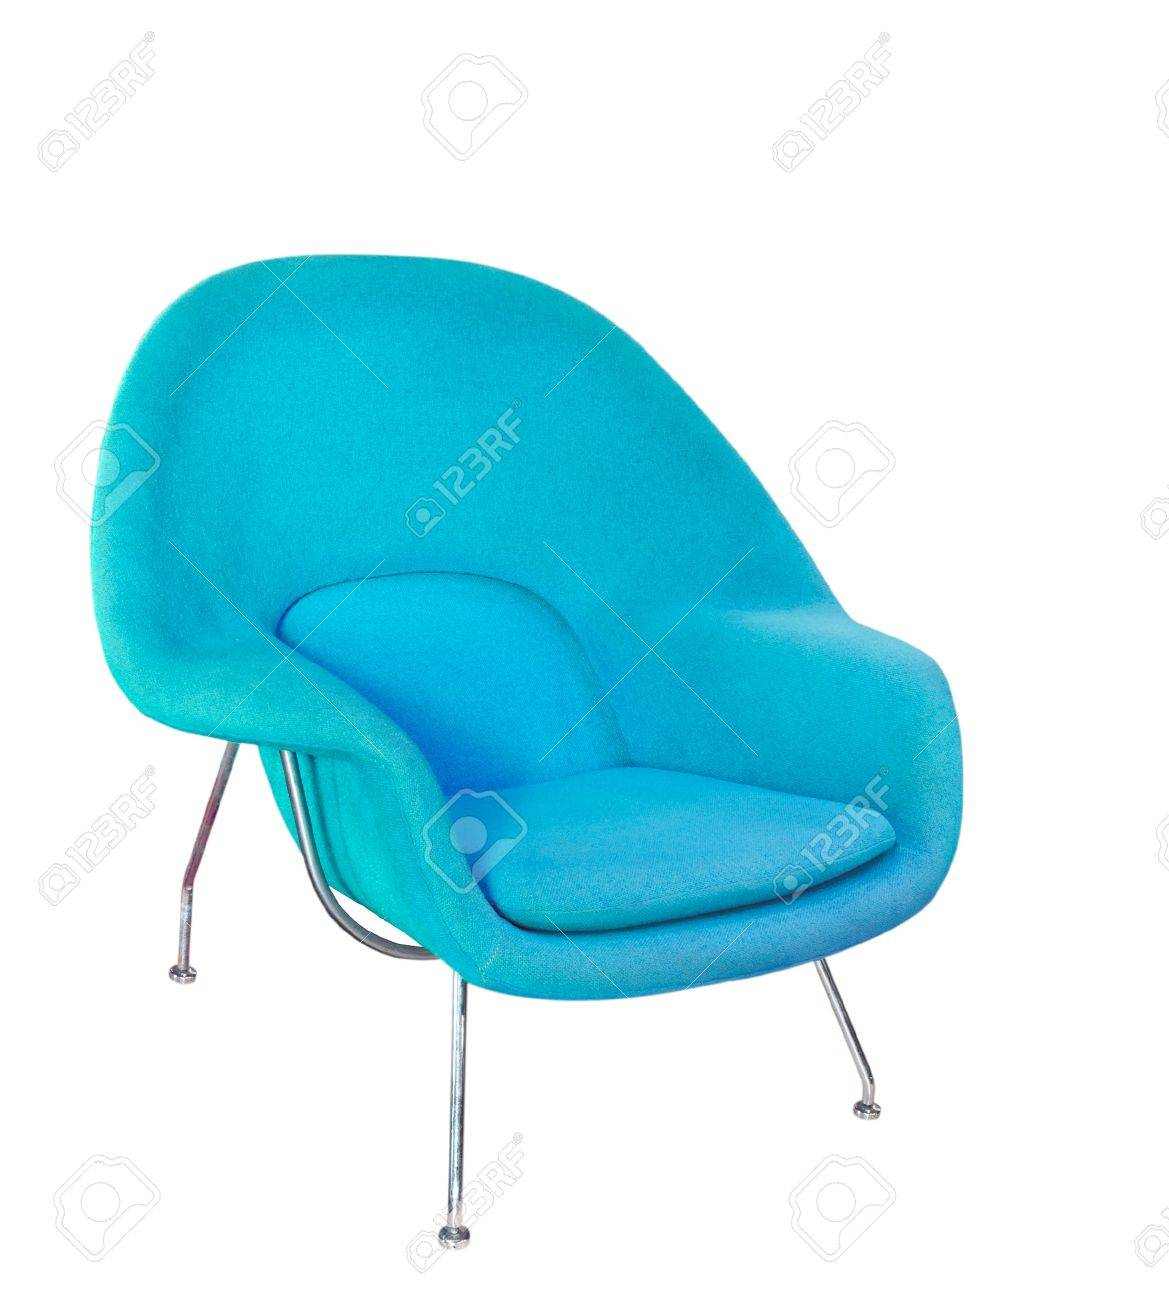 Moderne Fauteuil Wit.Blue Moderne Fauteuil Op Wit Wordt Geisoleerd